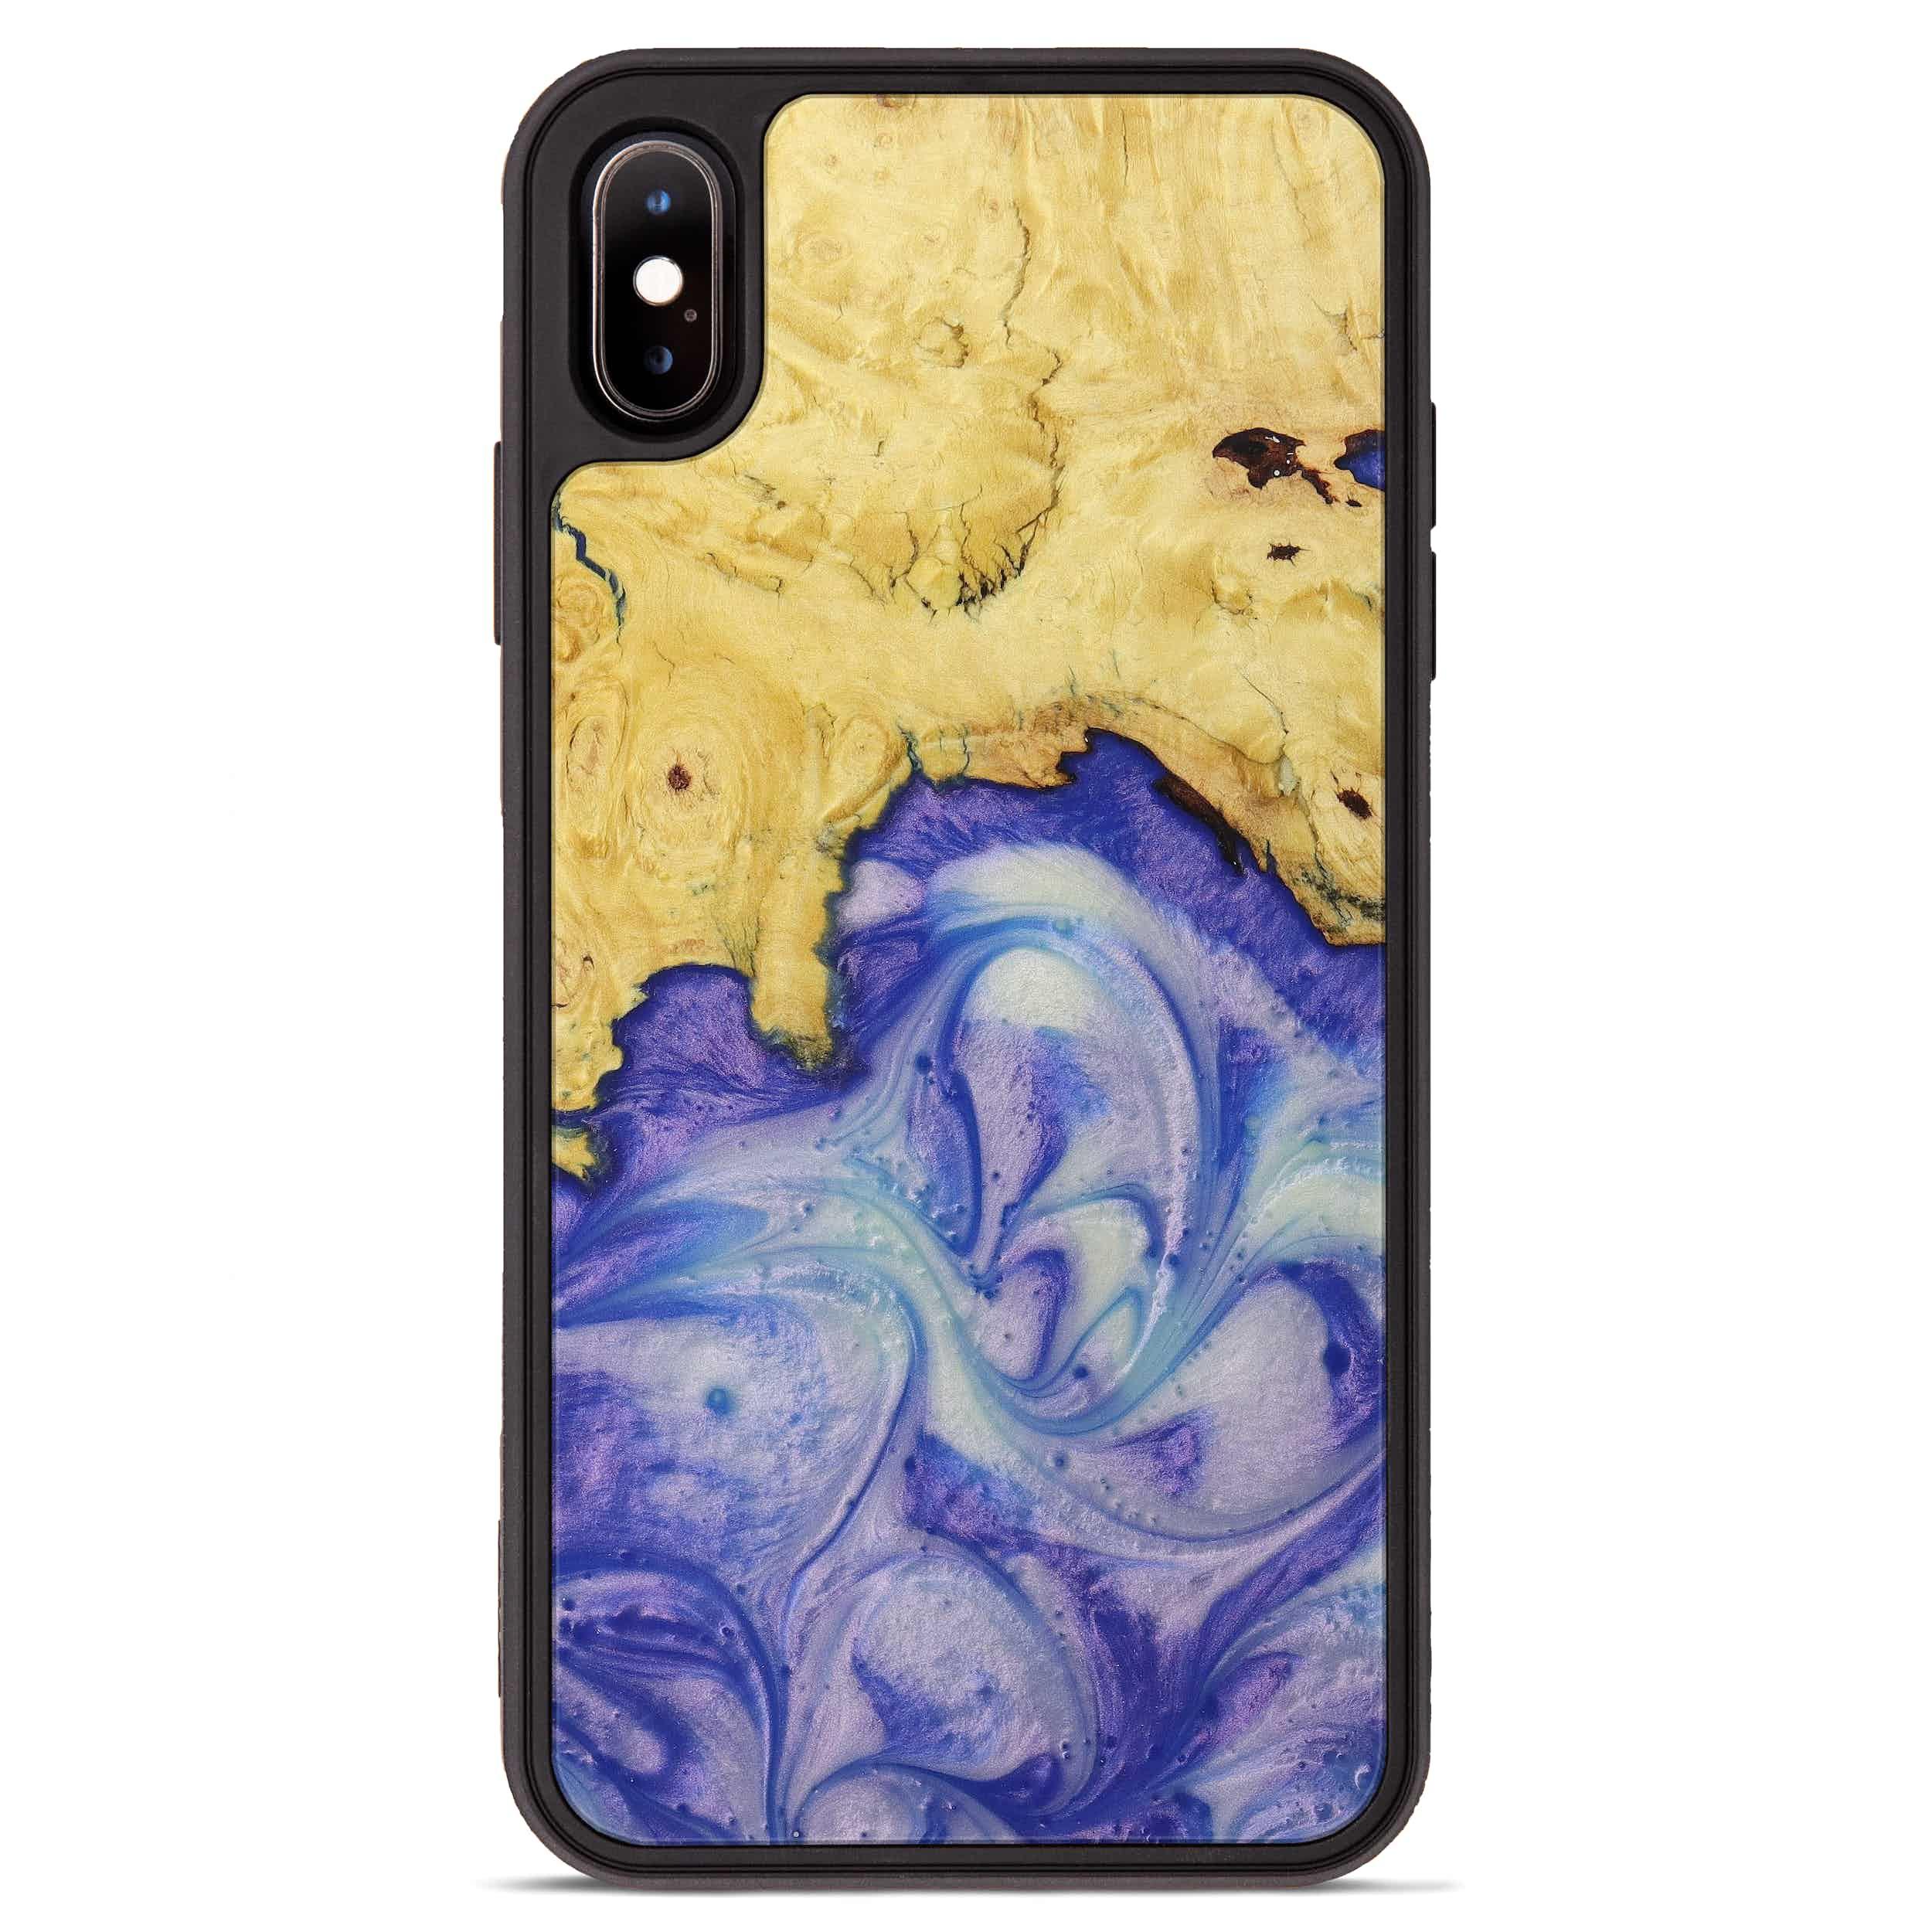 iPhone Xs Max Wood+Resin Phone Case - Harish (Purple, 395904)